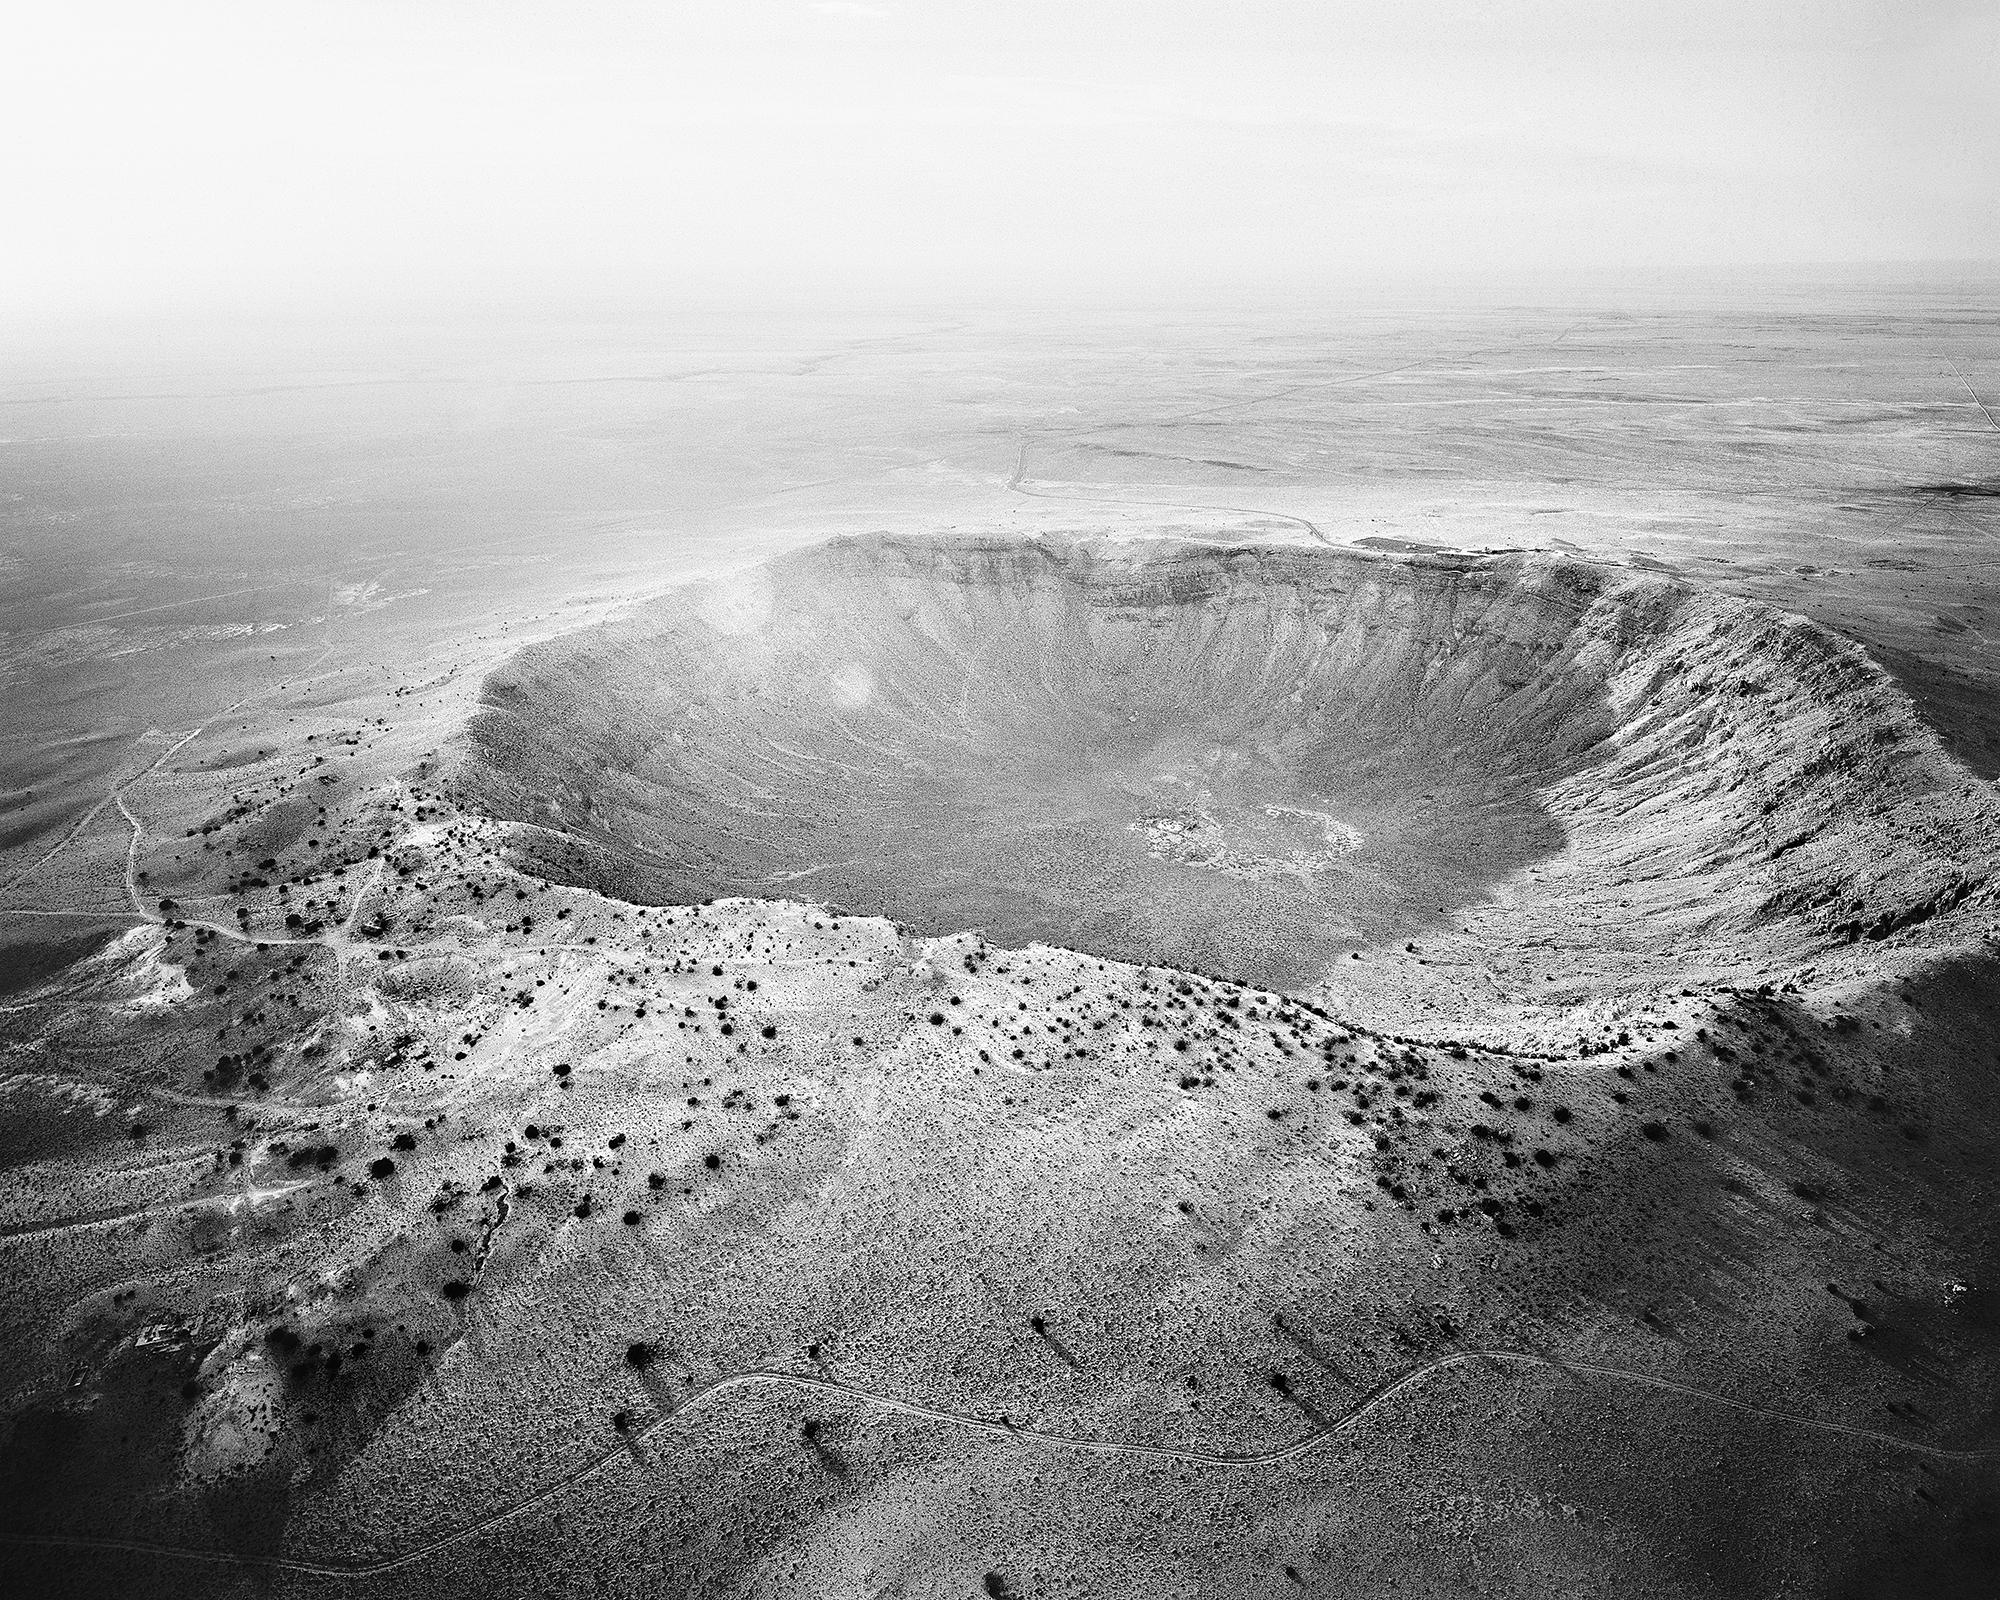 Michael Light, Meteor Crater Looking Northwest, Near Winslow, AZ; 2011